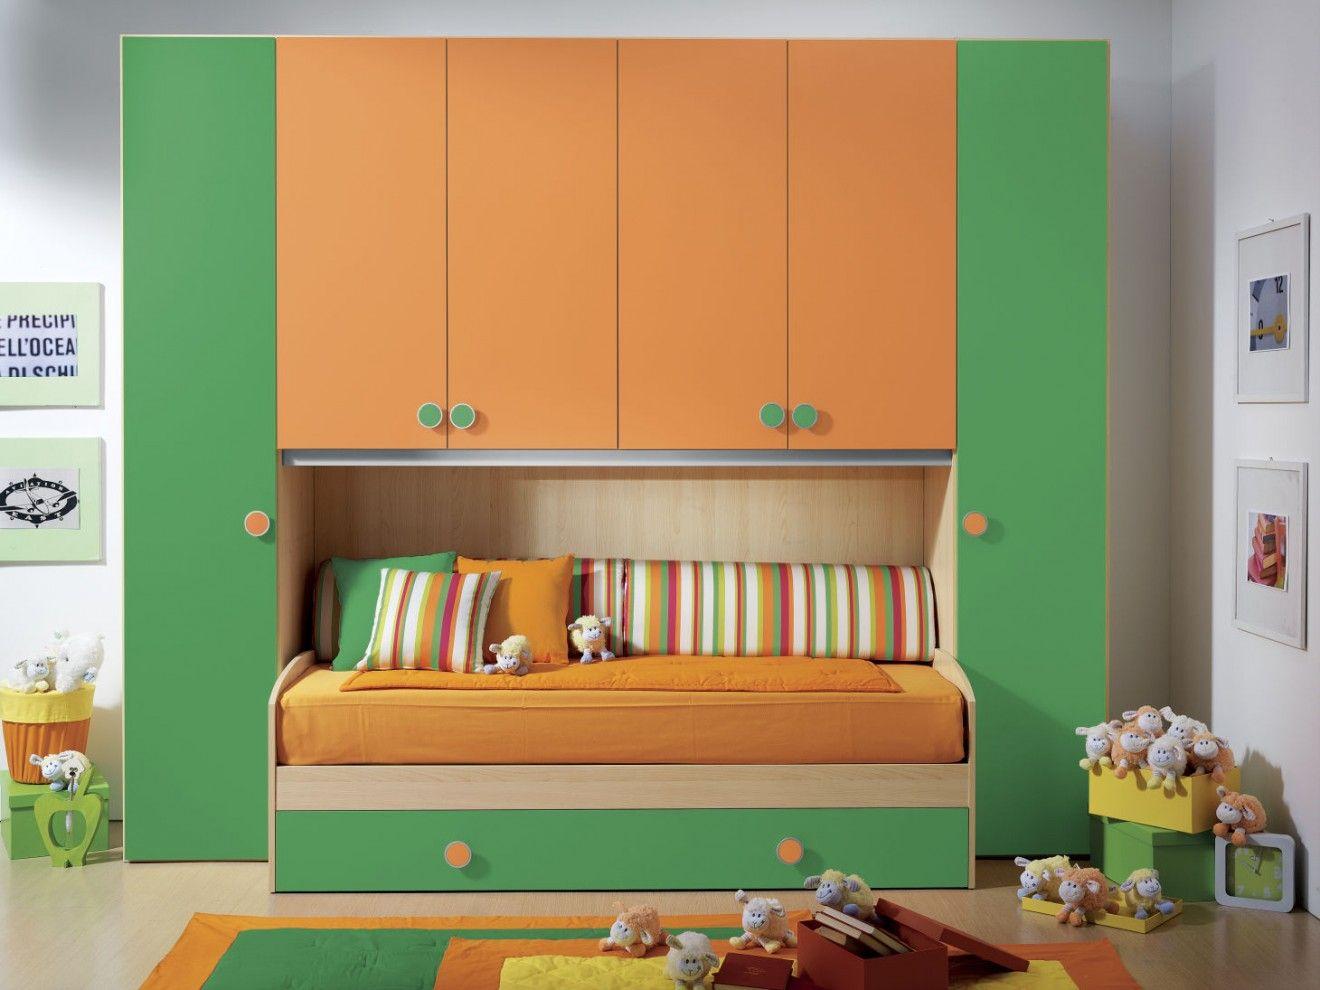 Camerette Valentini ~ Cameretta a ponte giulio furnishing bedroom camerette design